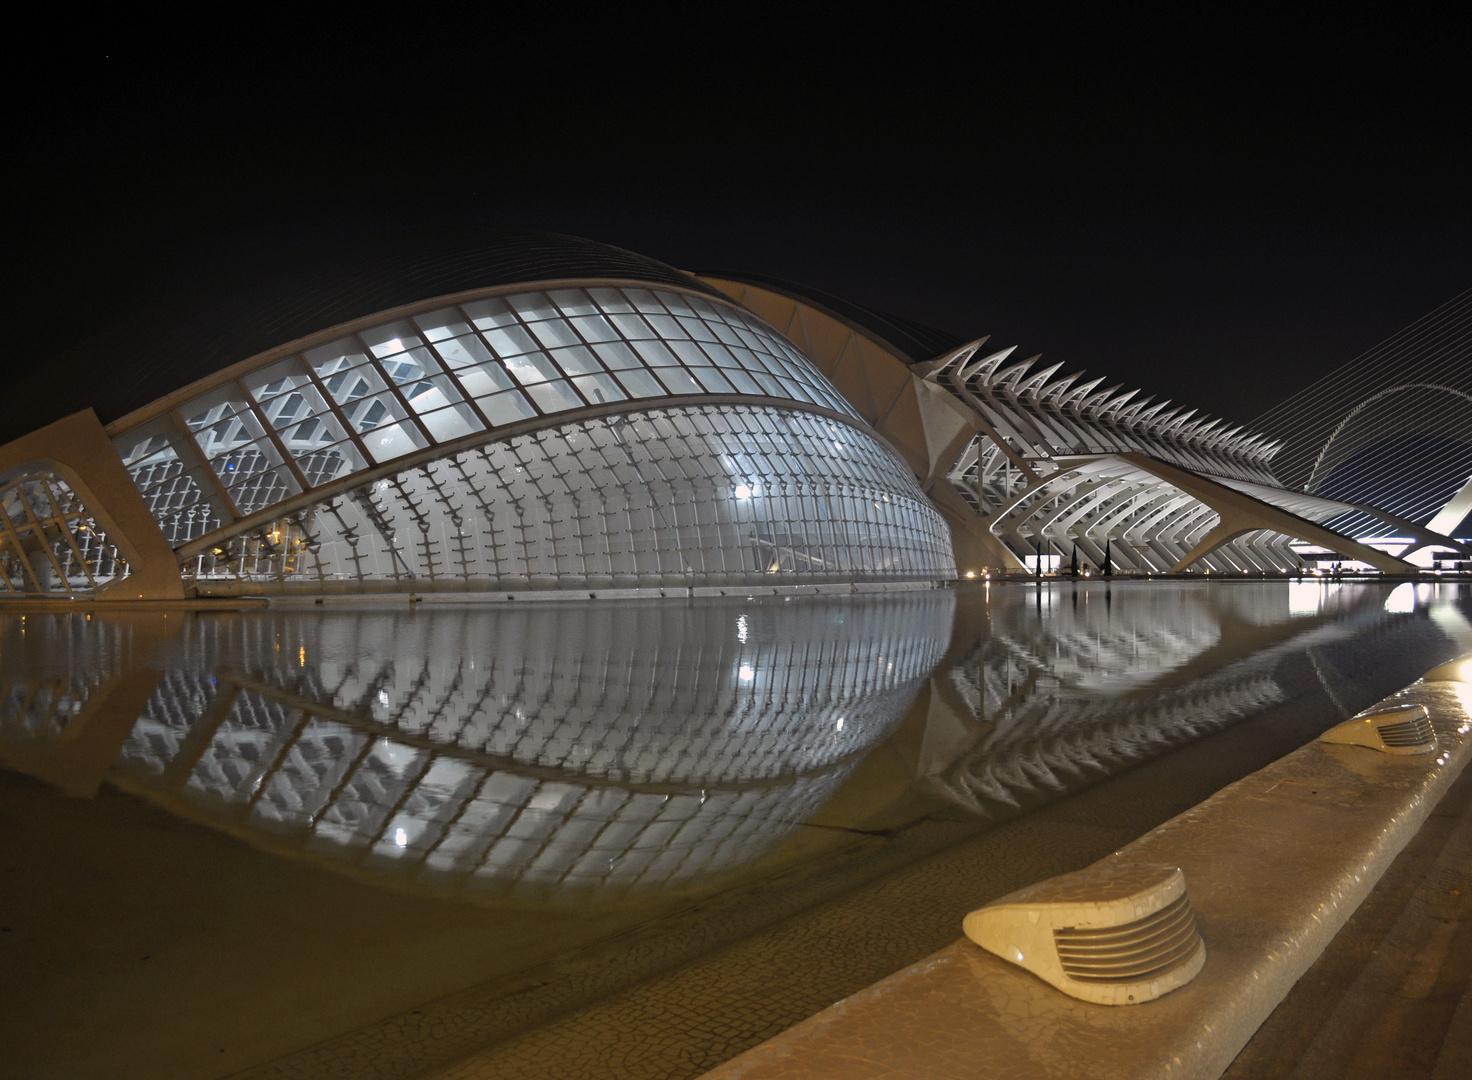 Architettura in Notturna